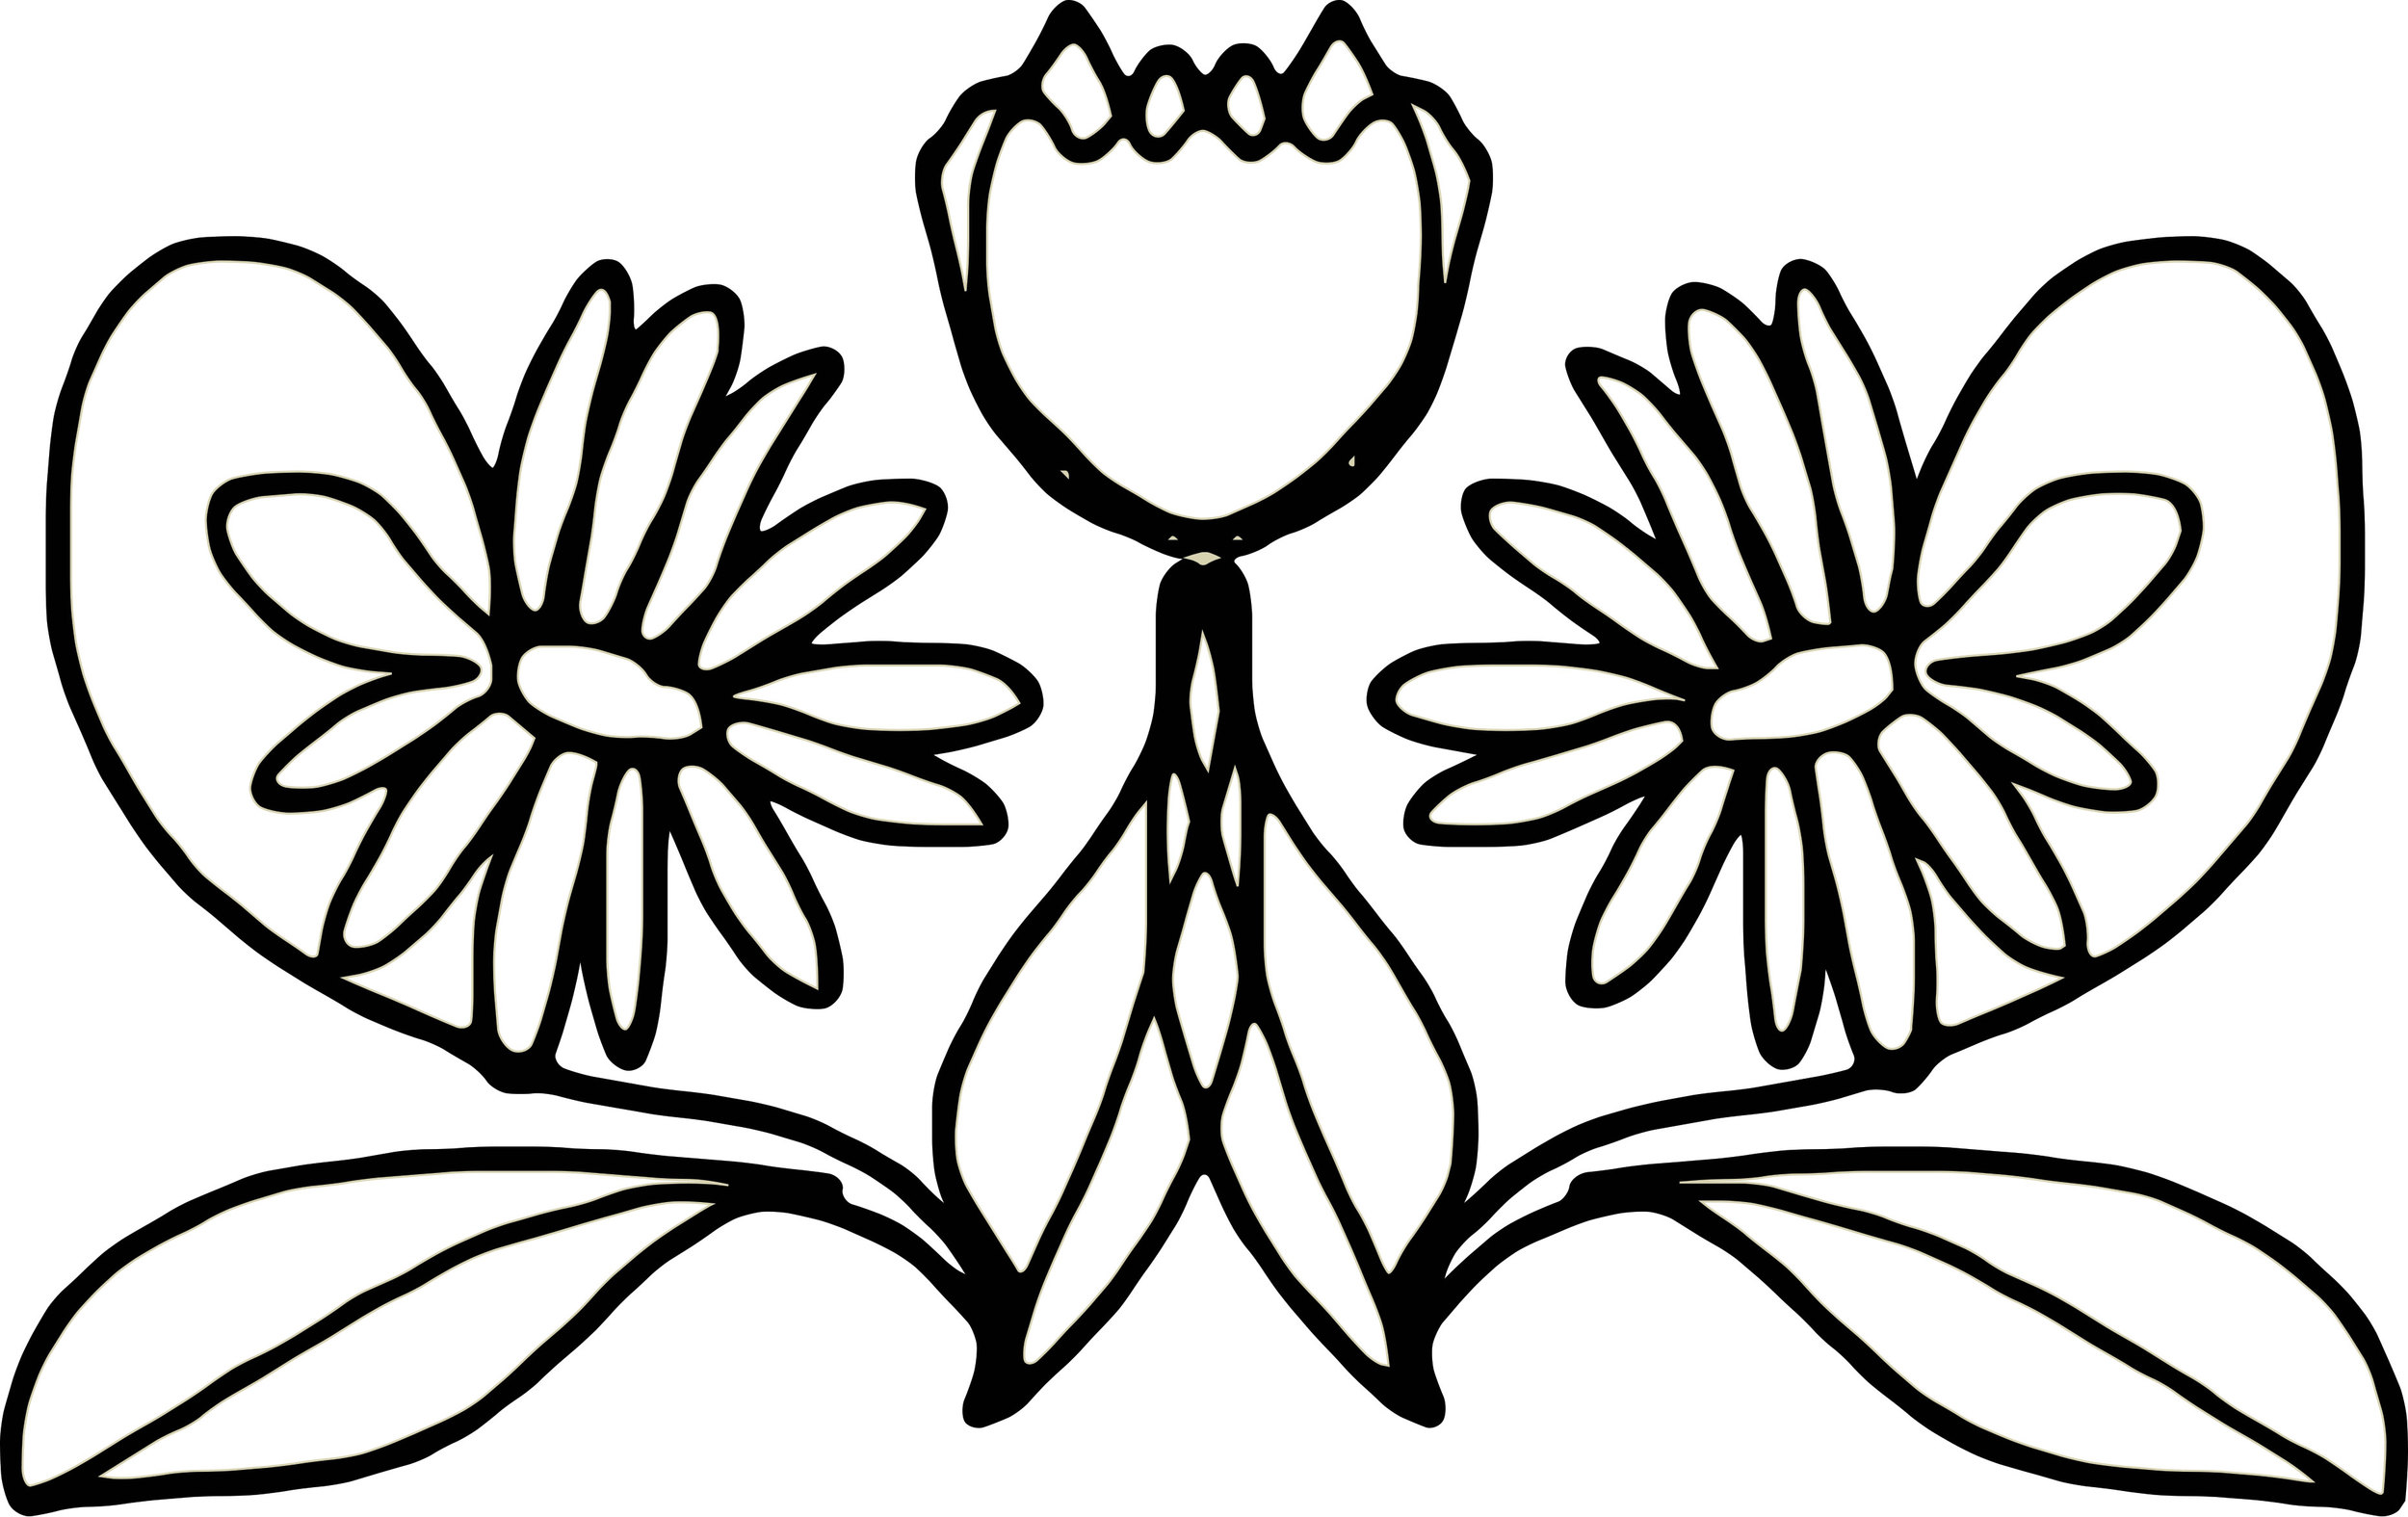 floral motif by Esther Jongste